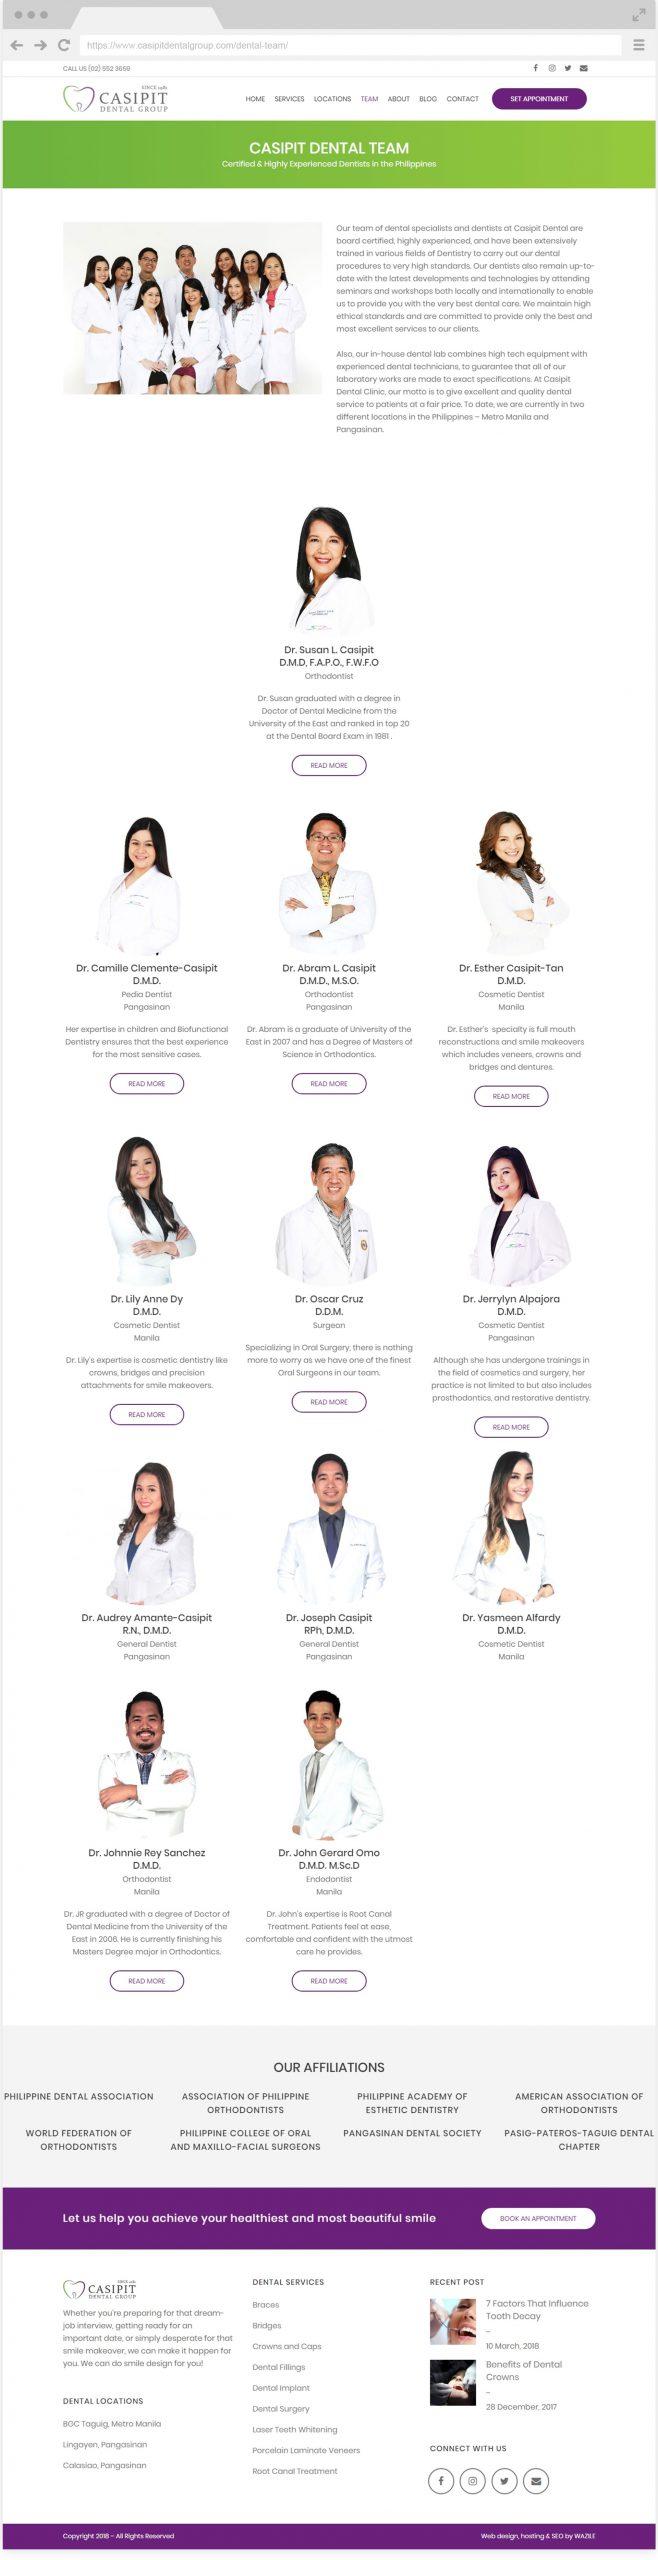 Casipit Dental Group Team